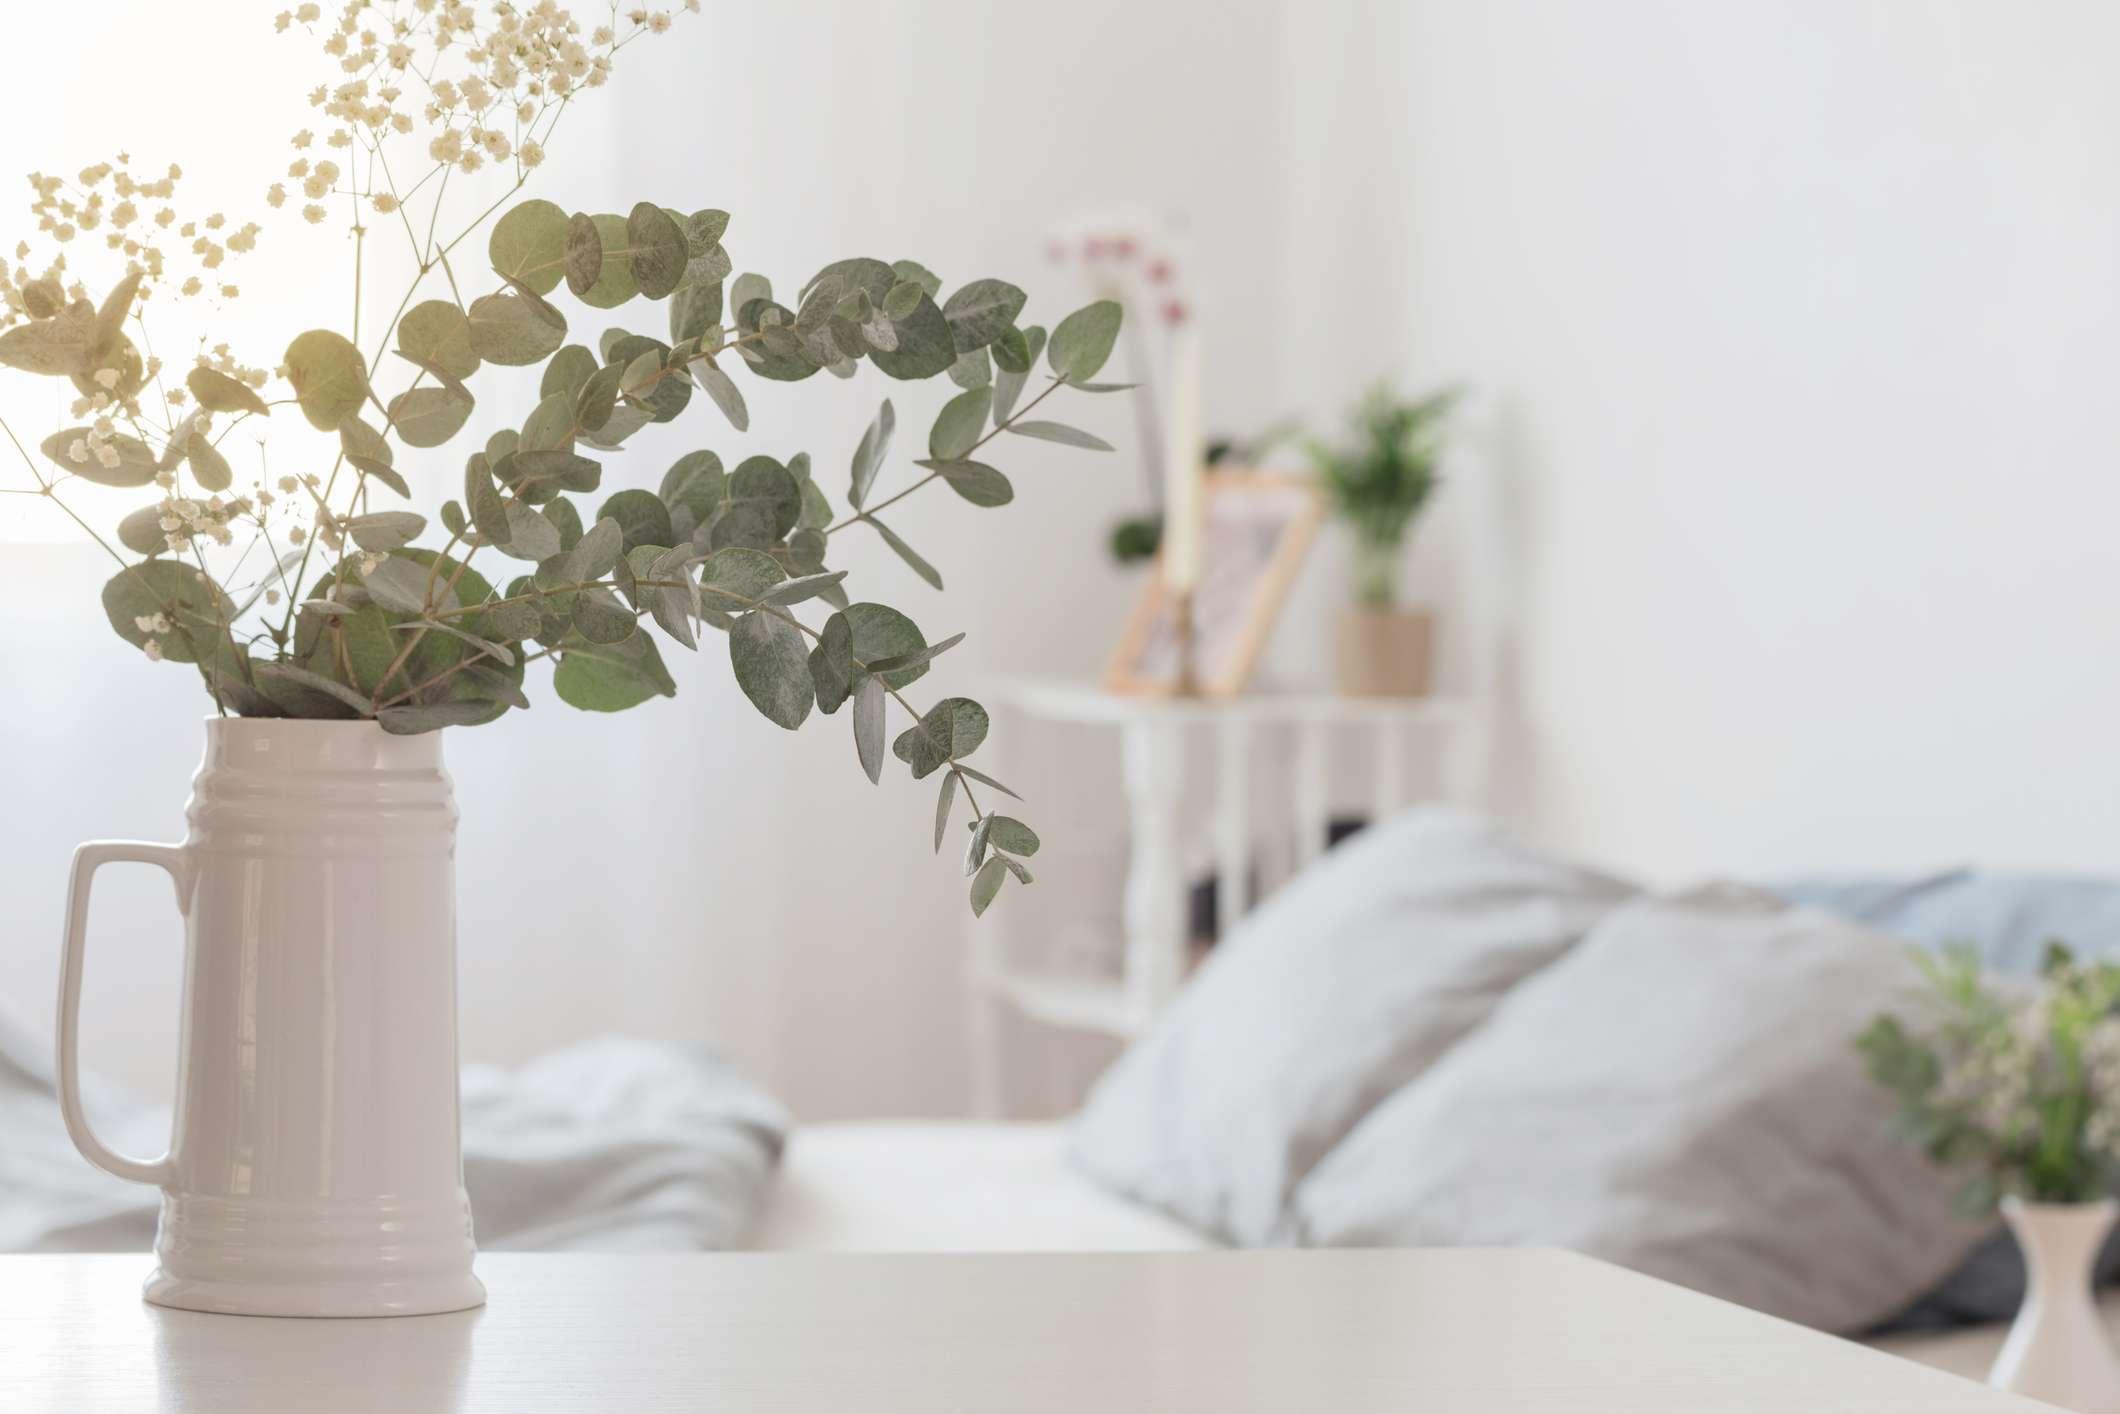 Vase with eucalyptus leaves in bedroom